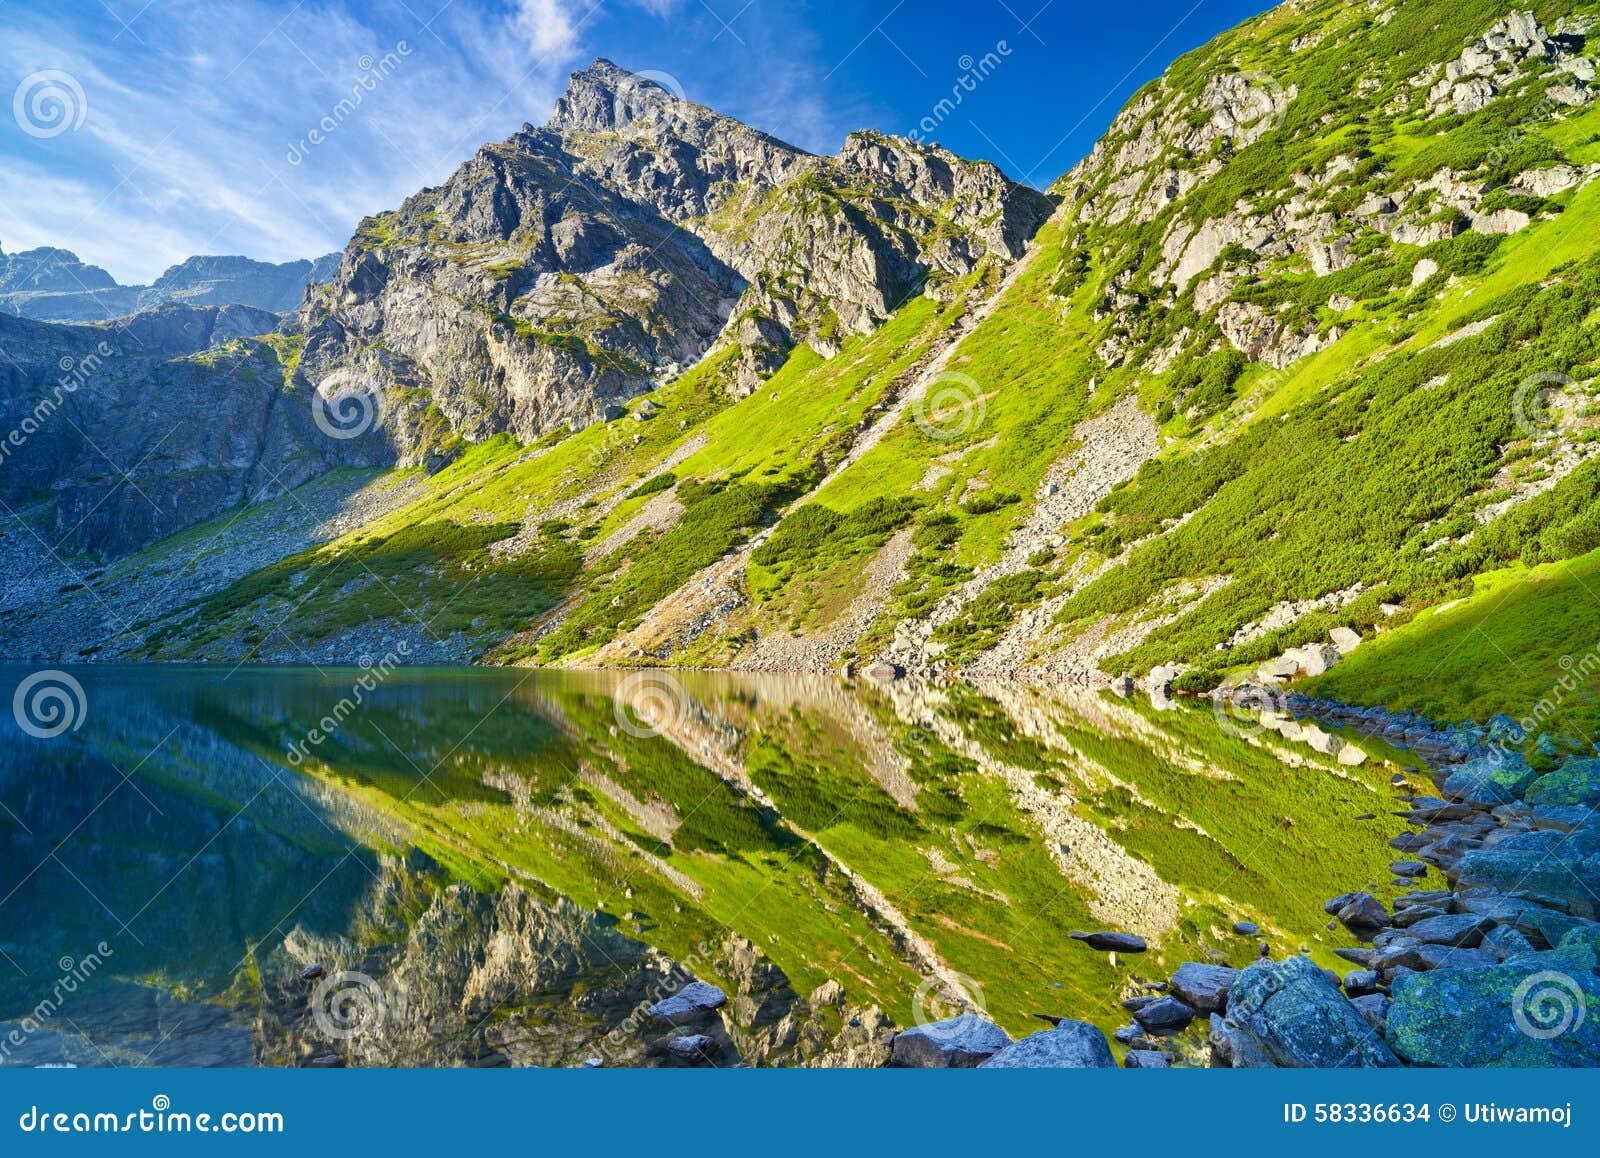 Nature Images 2mb: Tatra Mountains Landscape Nature Lake Pond Carpathians